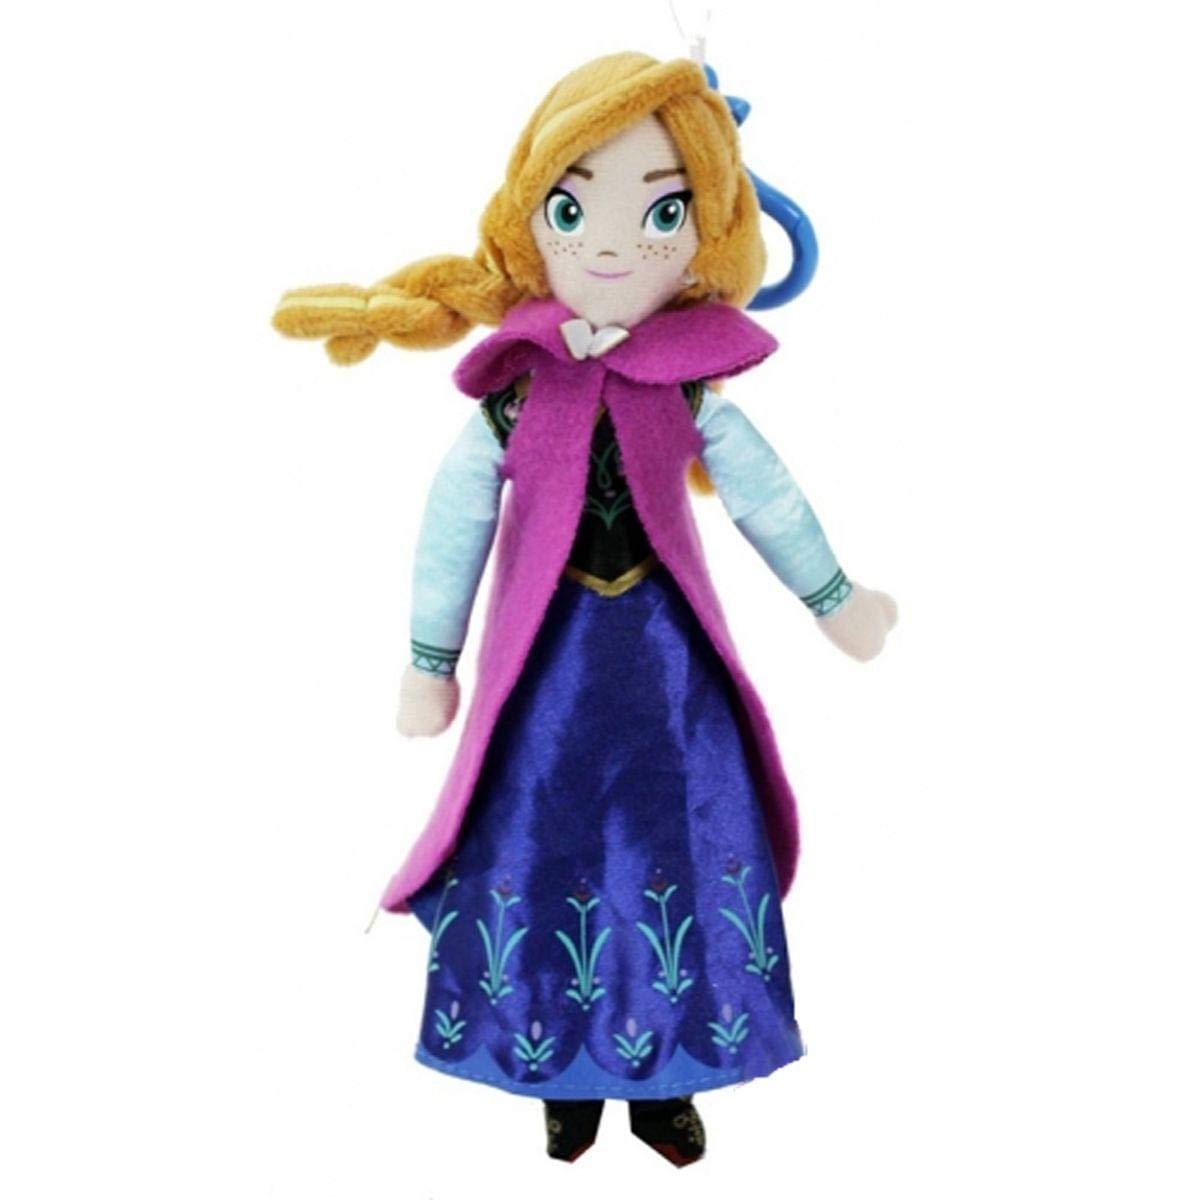 Fast Forward Disney Frozen Anna Coin Purse - 6' FCLMC04WN